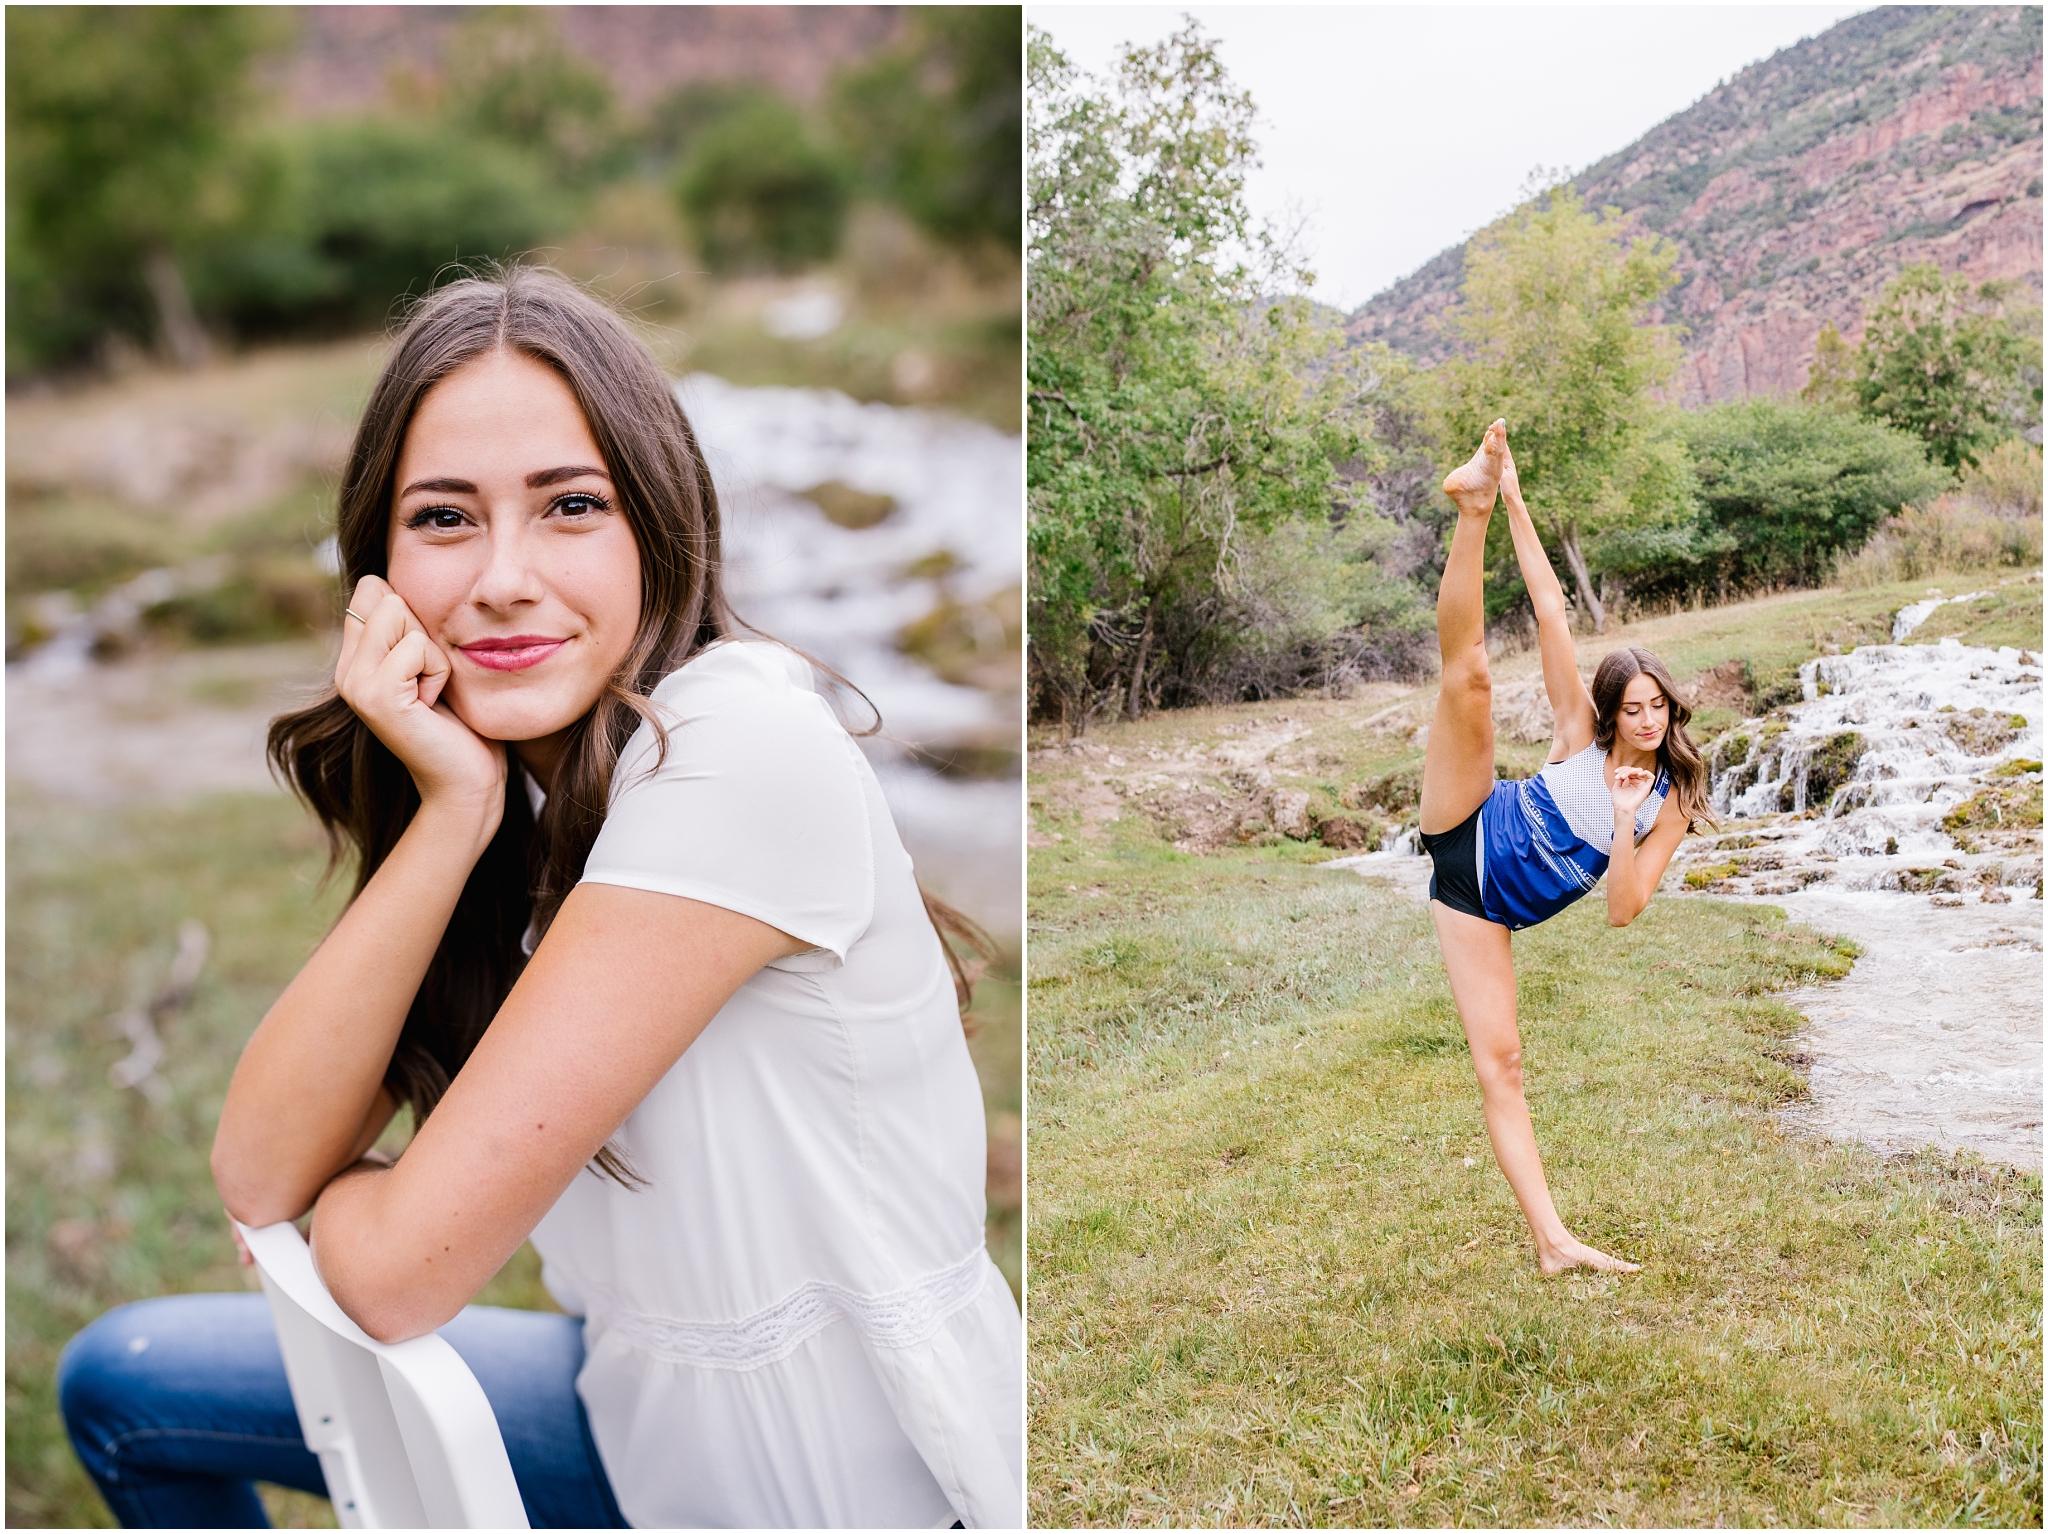 GVHSDRILL-102_Lizzie-B-Imagery-Utah-Family-Photographer-Central-Utah-Park-City-Salt-Lake-City-Drill-Team-Photography-Dance.jpg